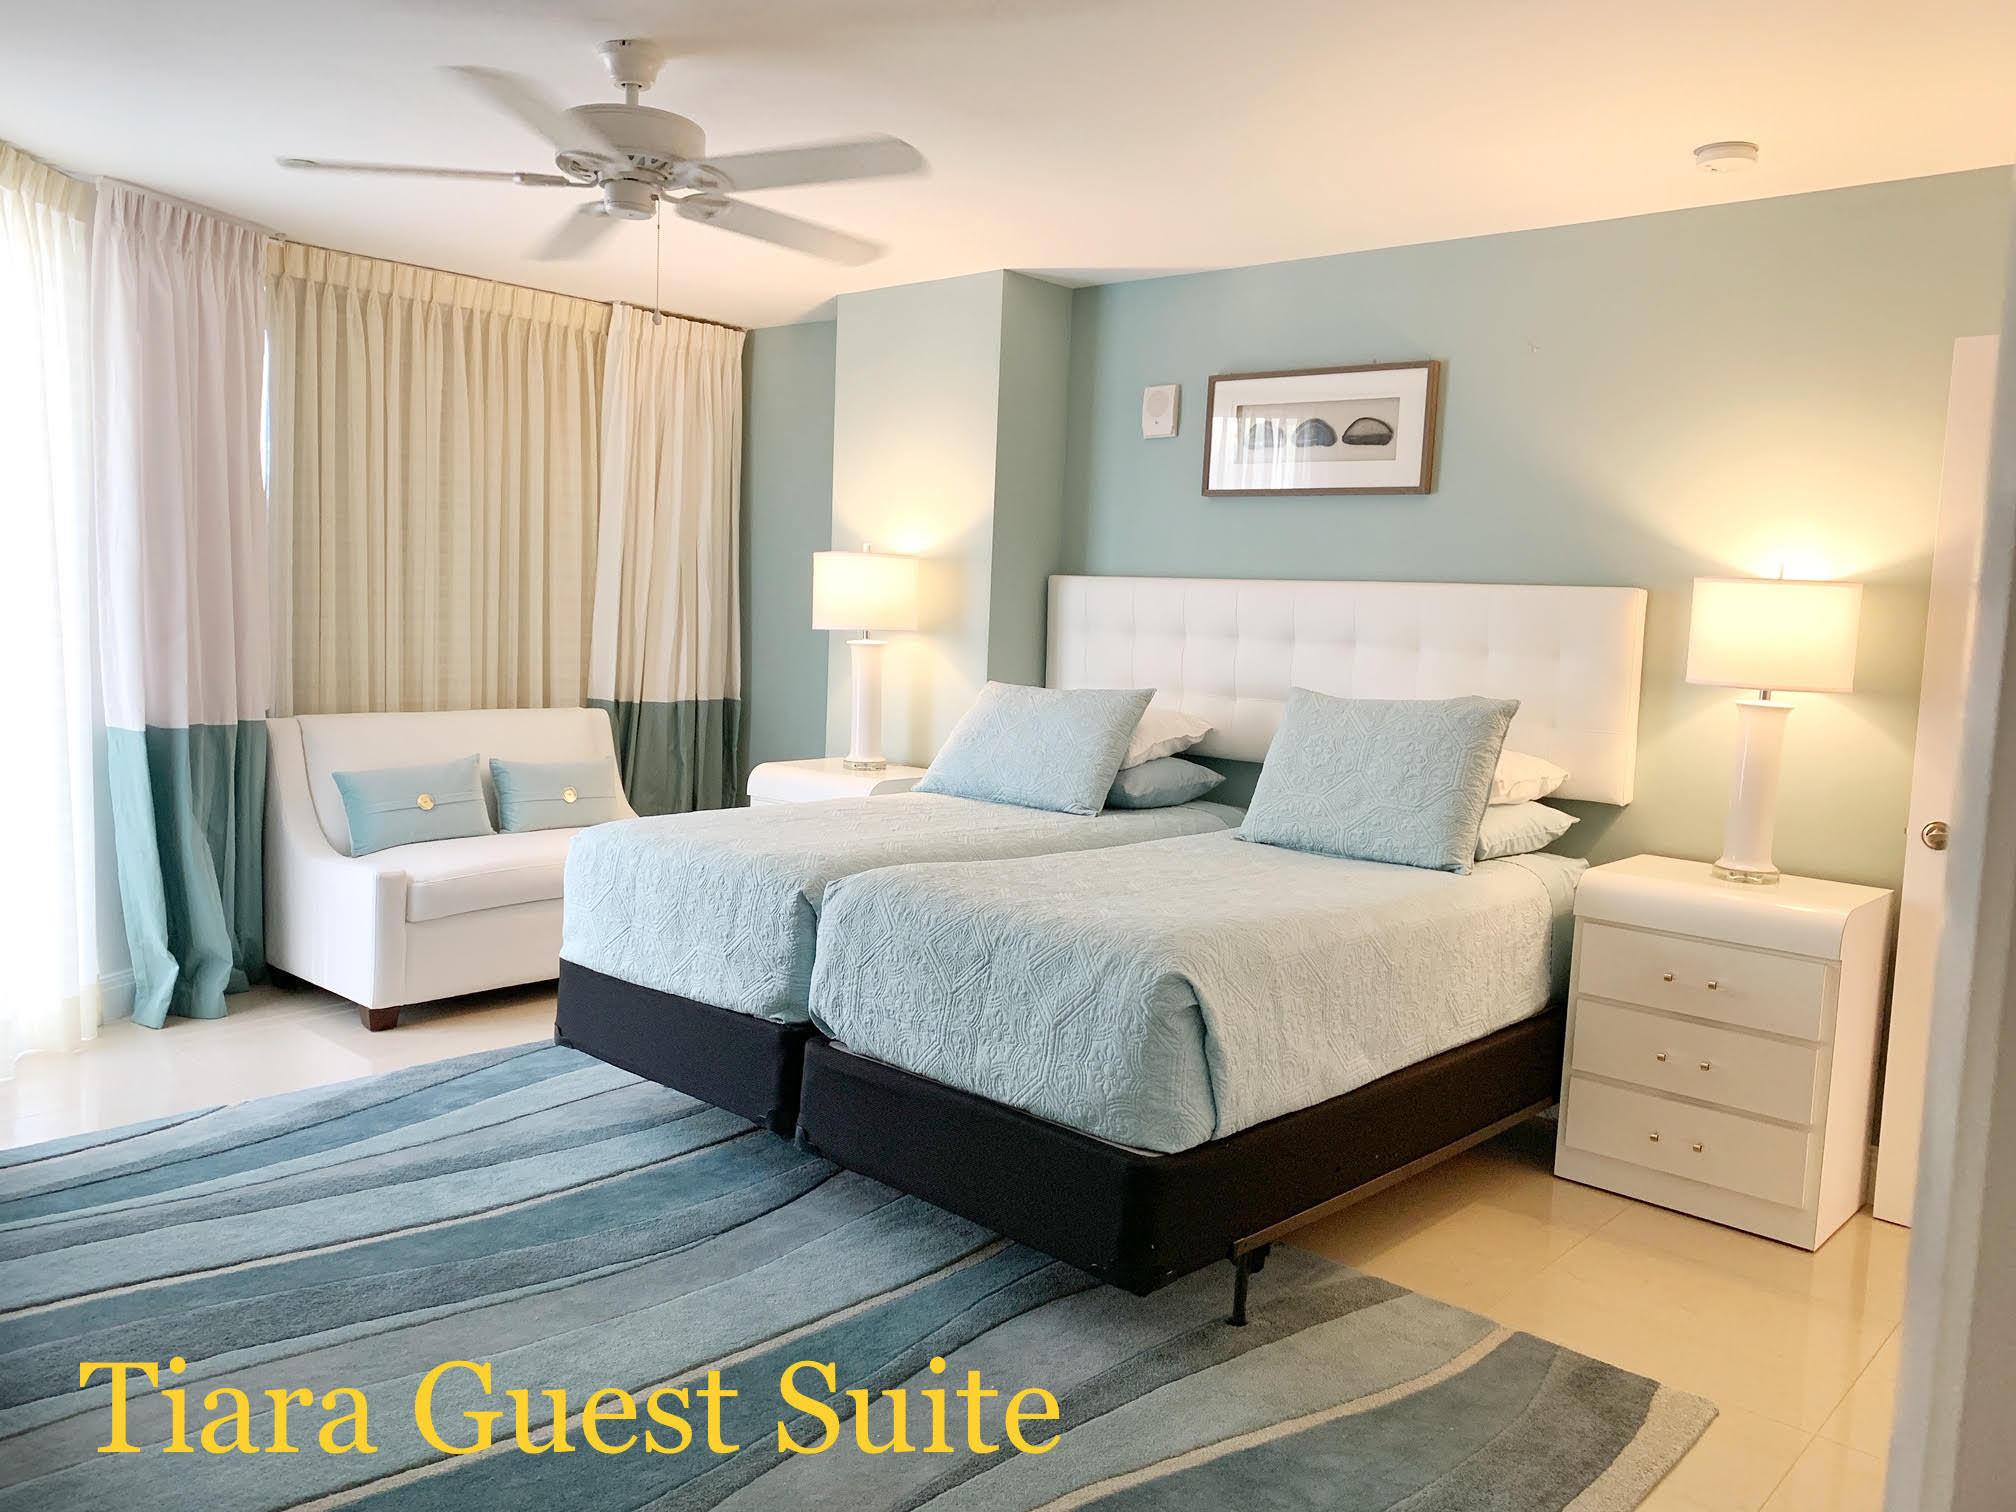 8 Tiara Guest Suite